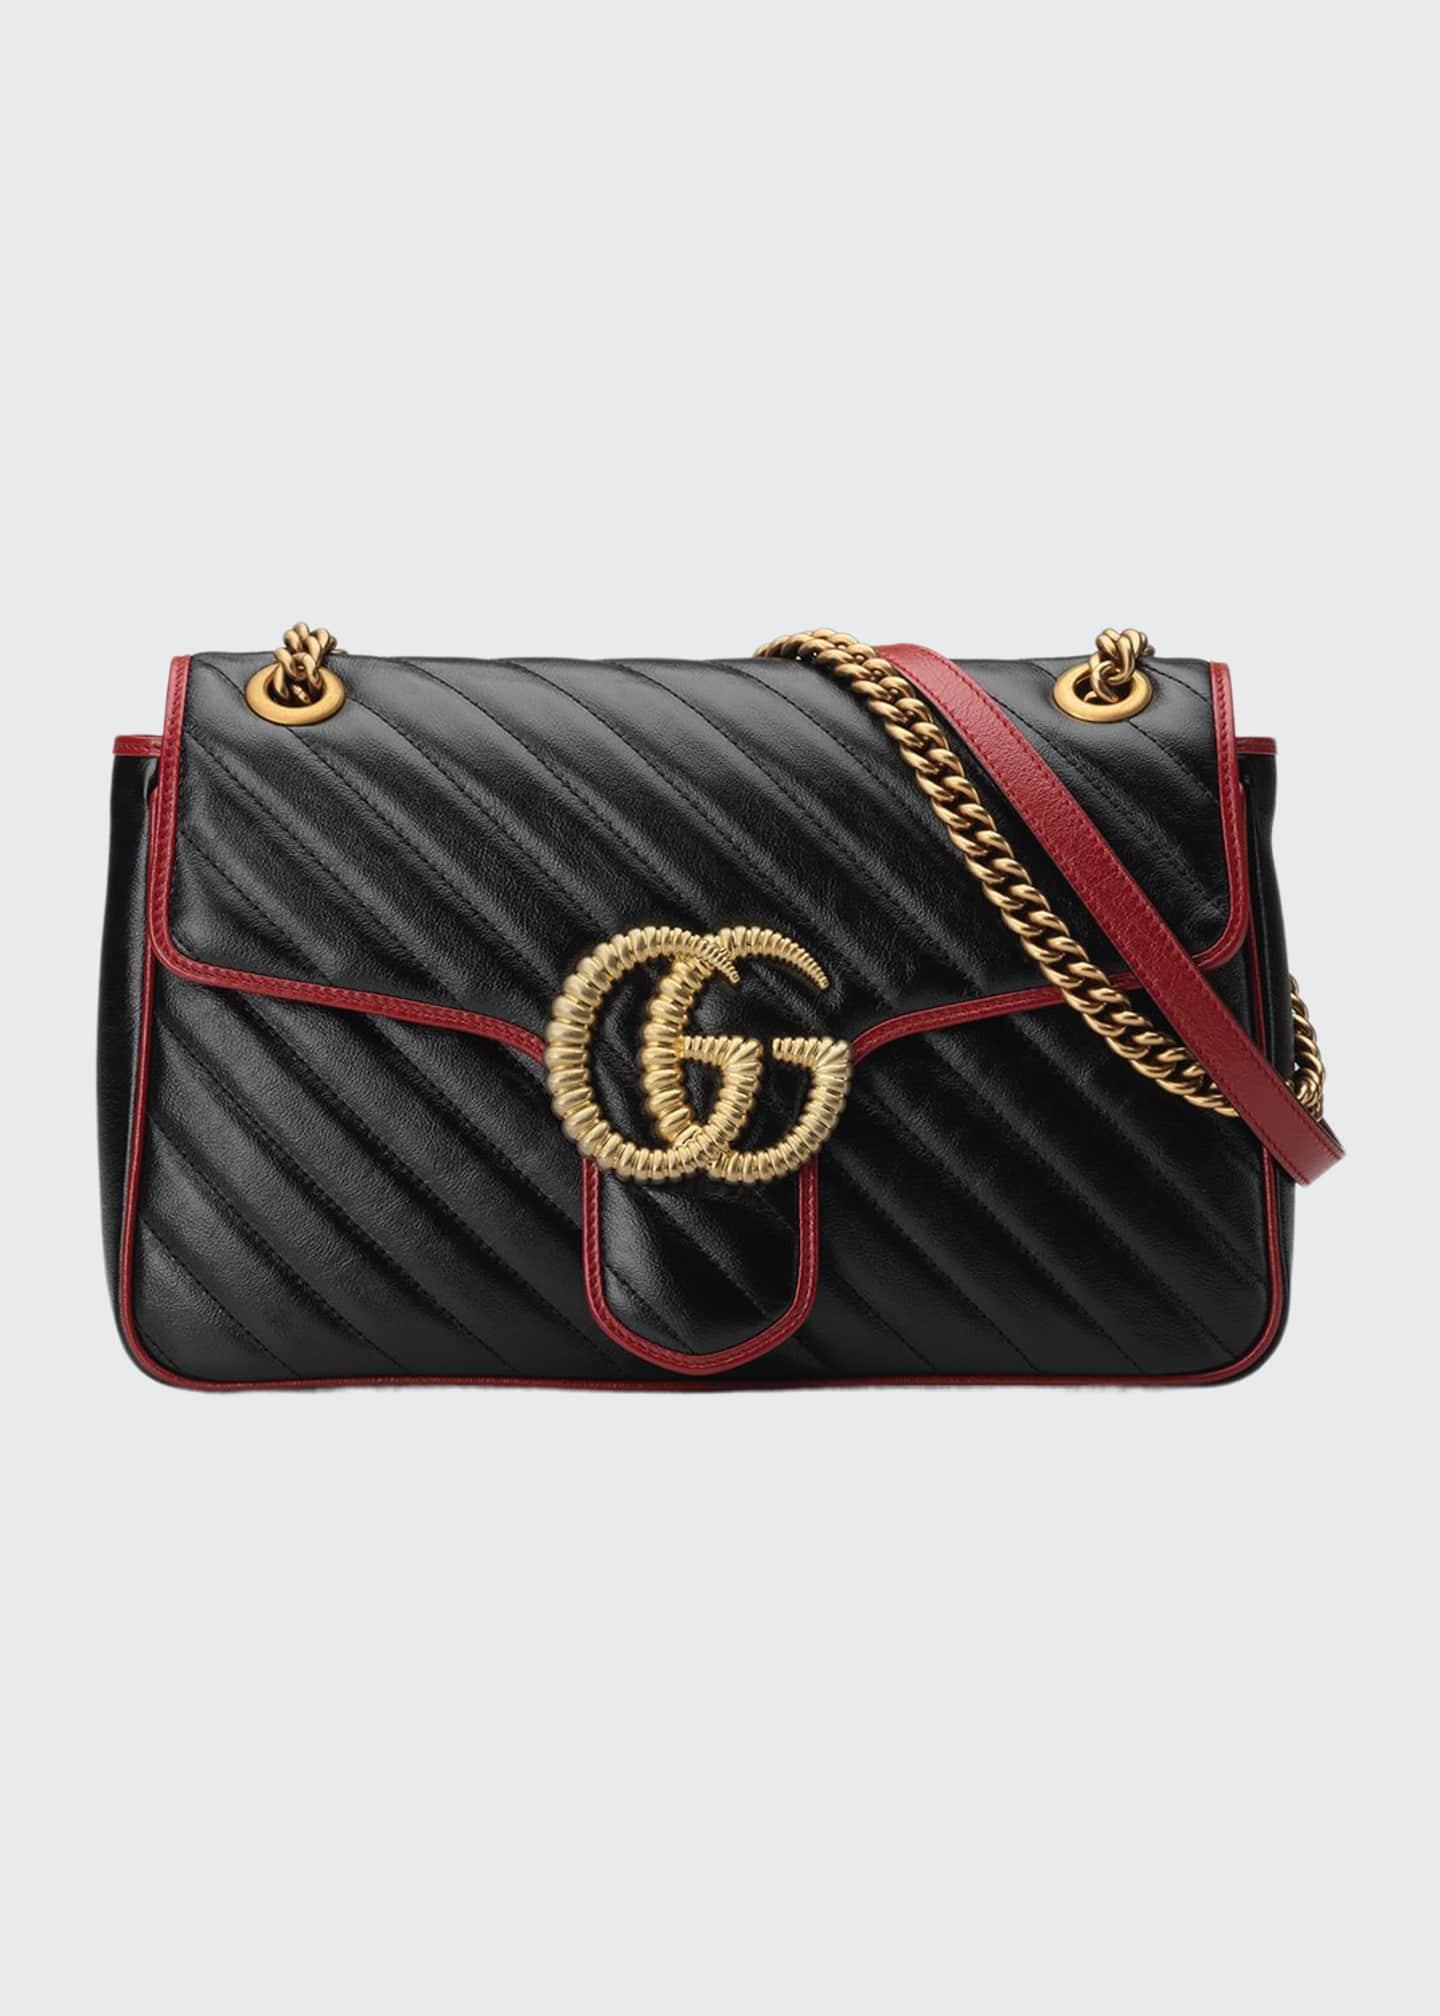 Gucci GG Marmont 20 Medium Shoulder